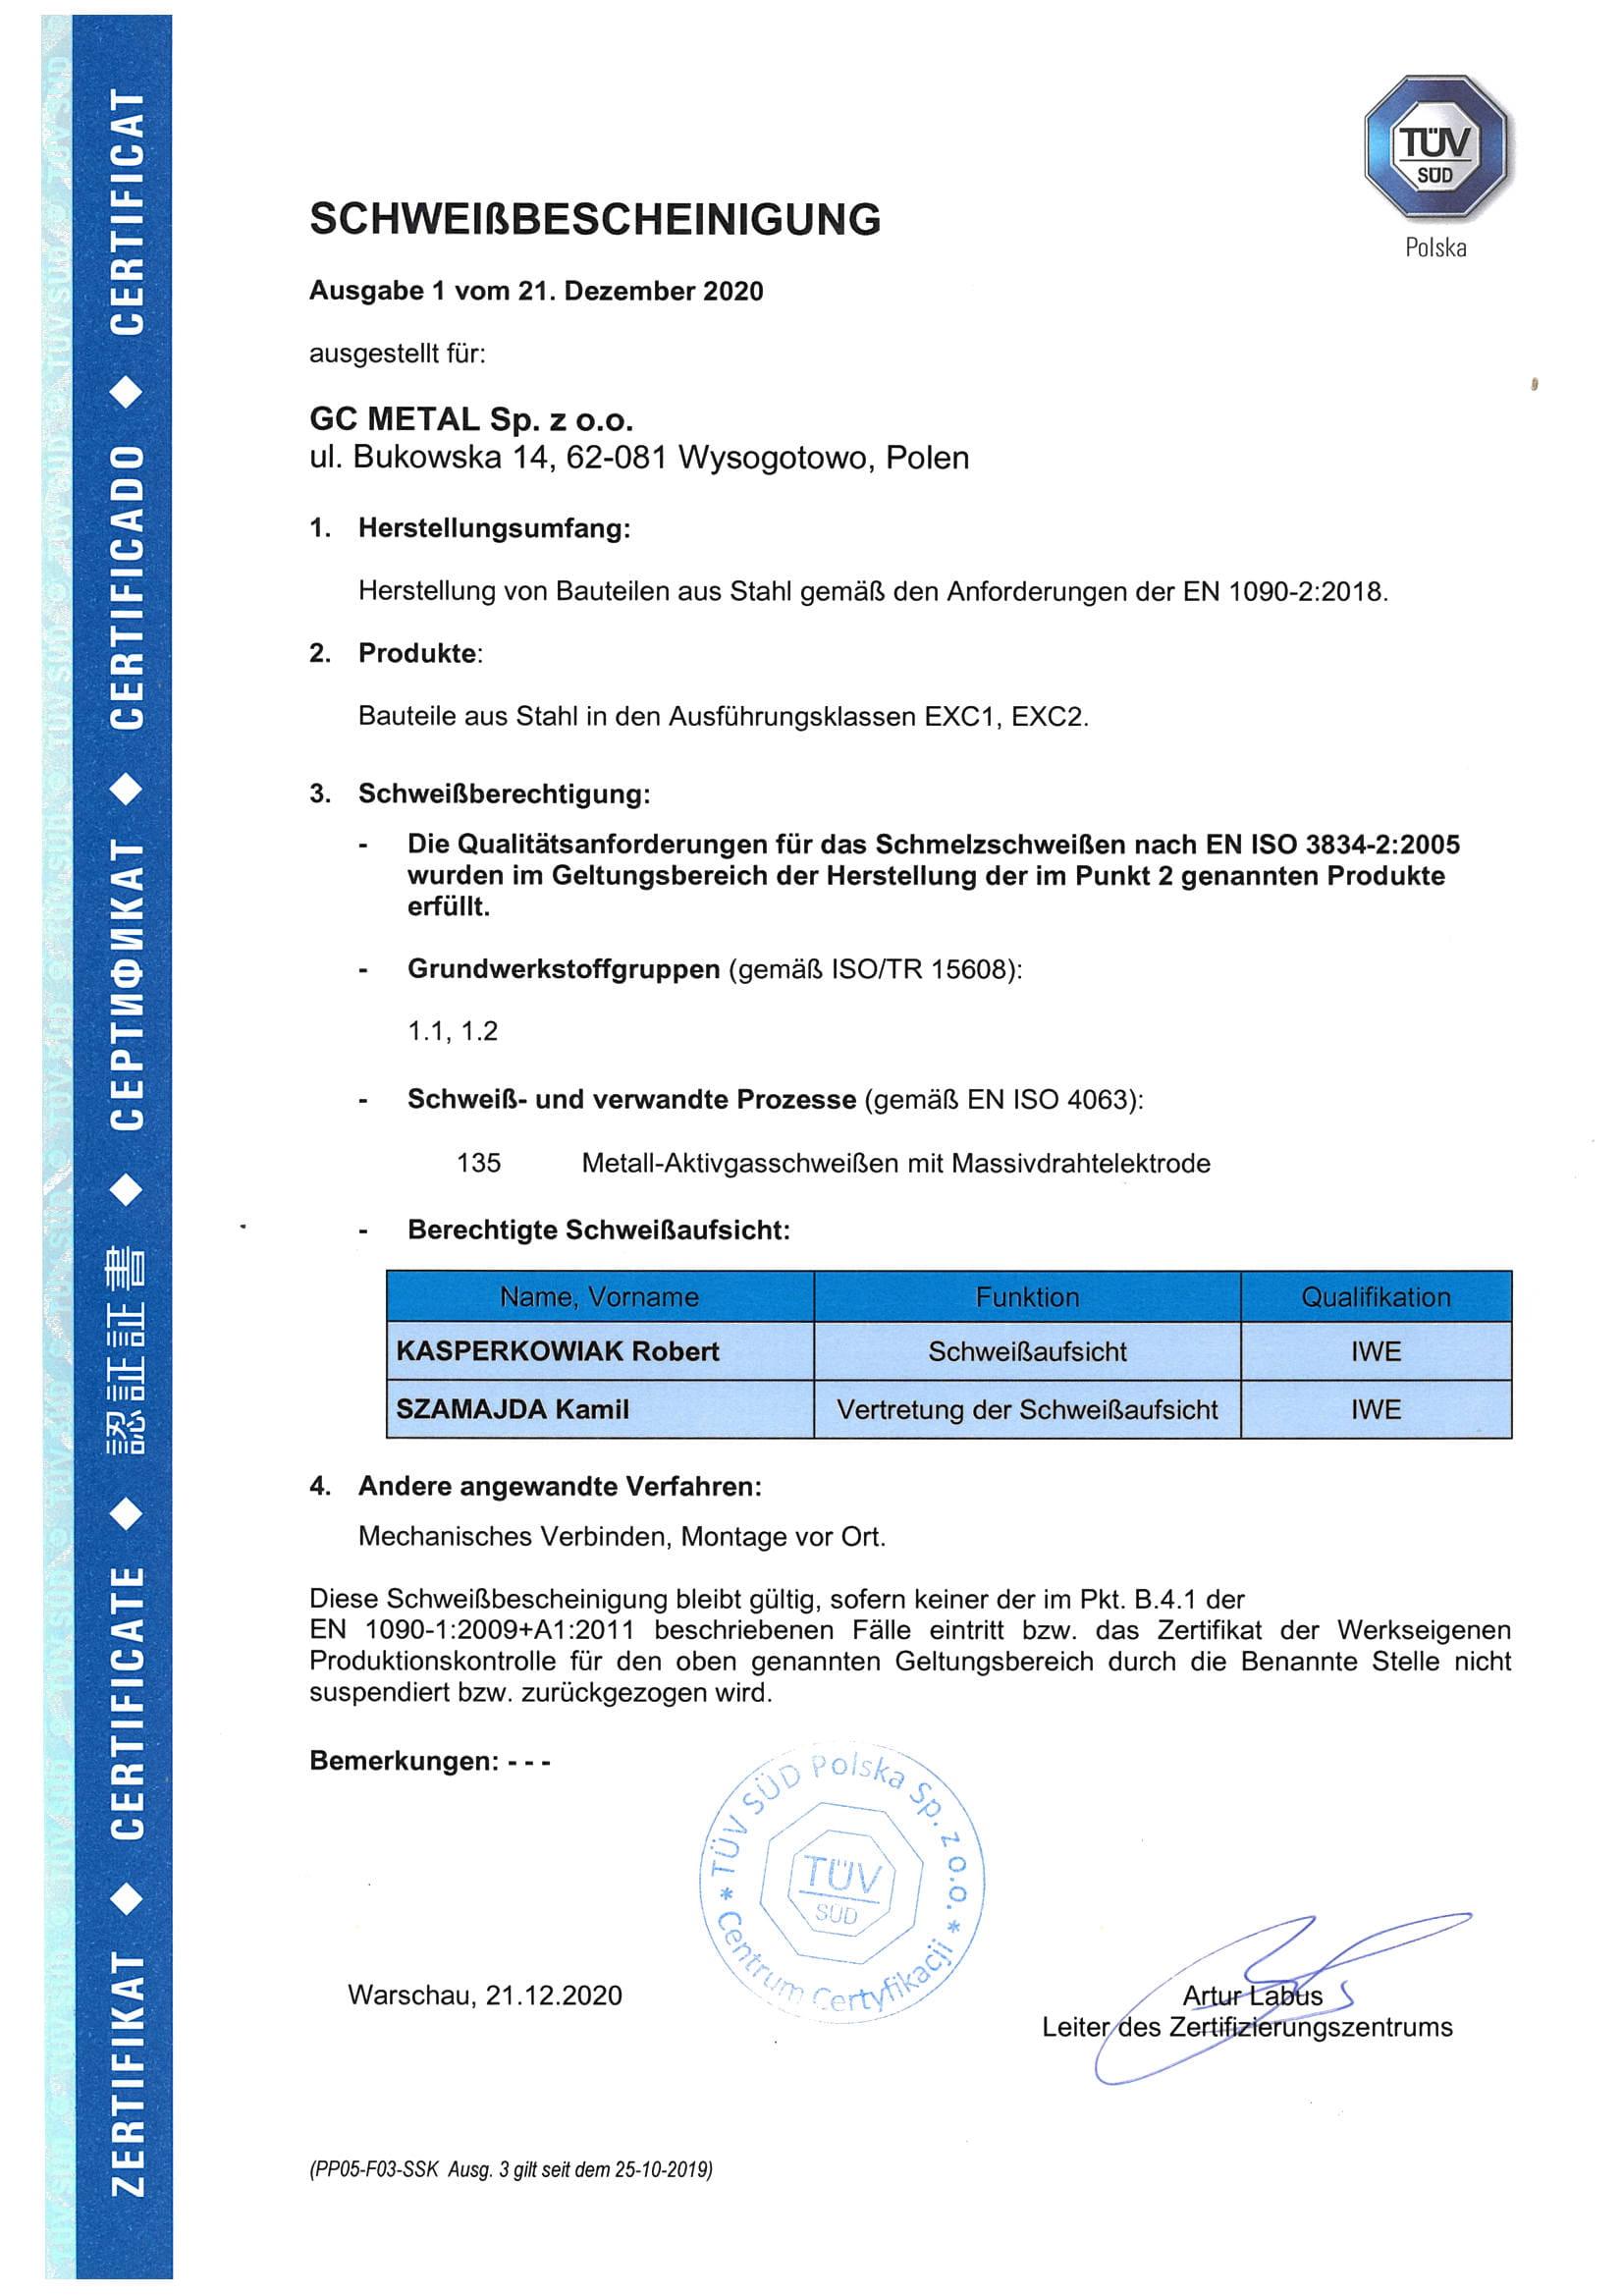 Certyfikat DE (3)